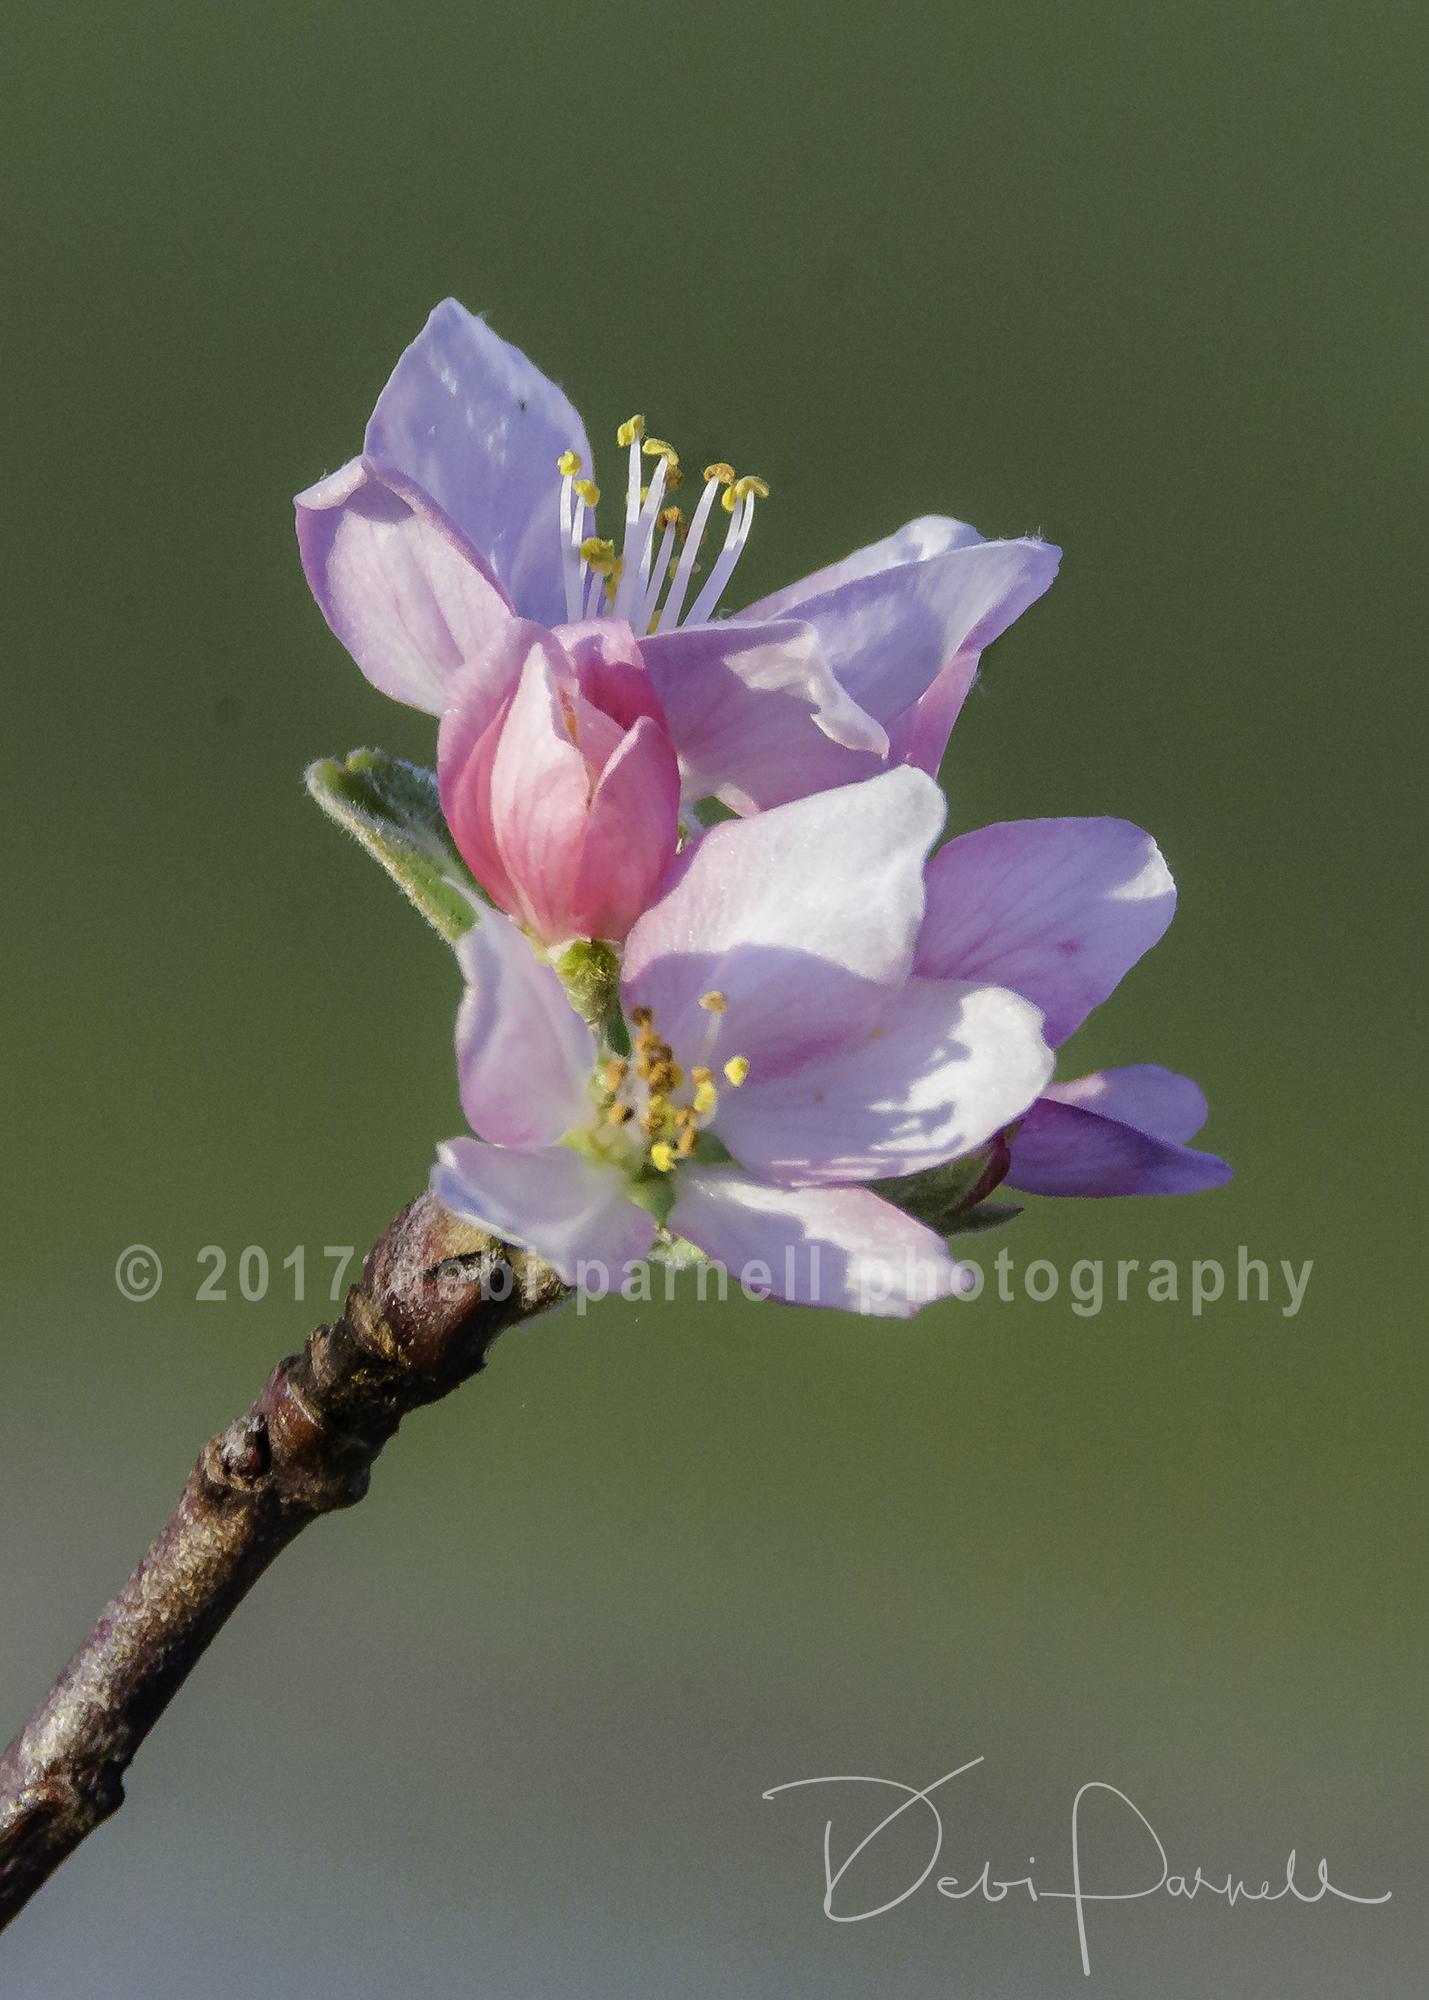 Copy of Anna Apple Blossom FL-005